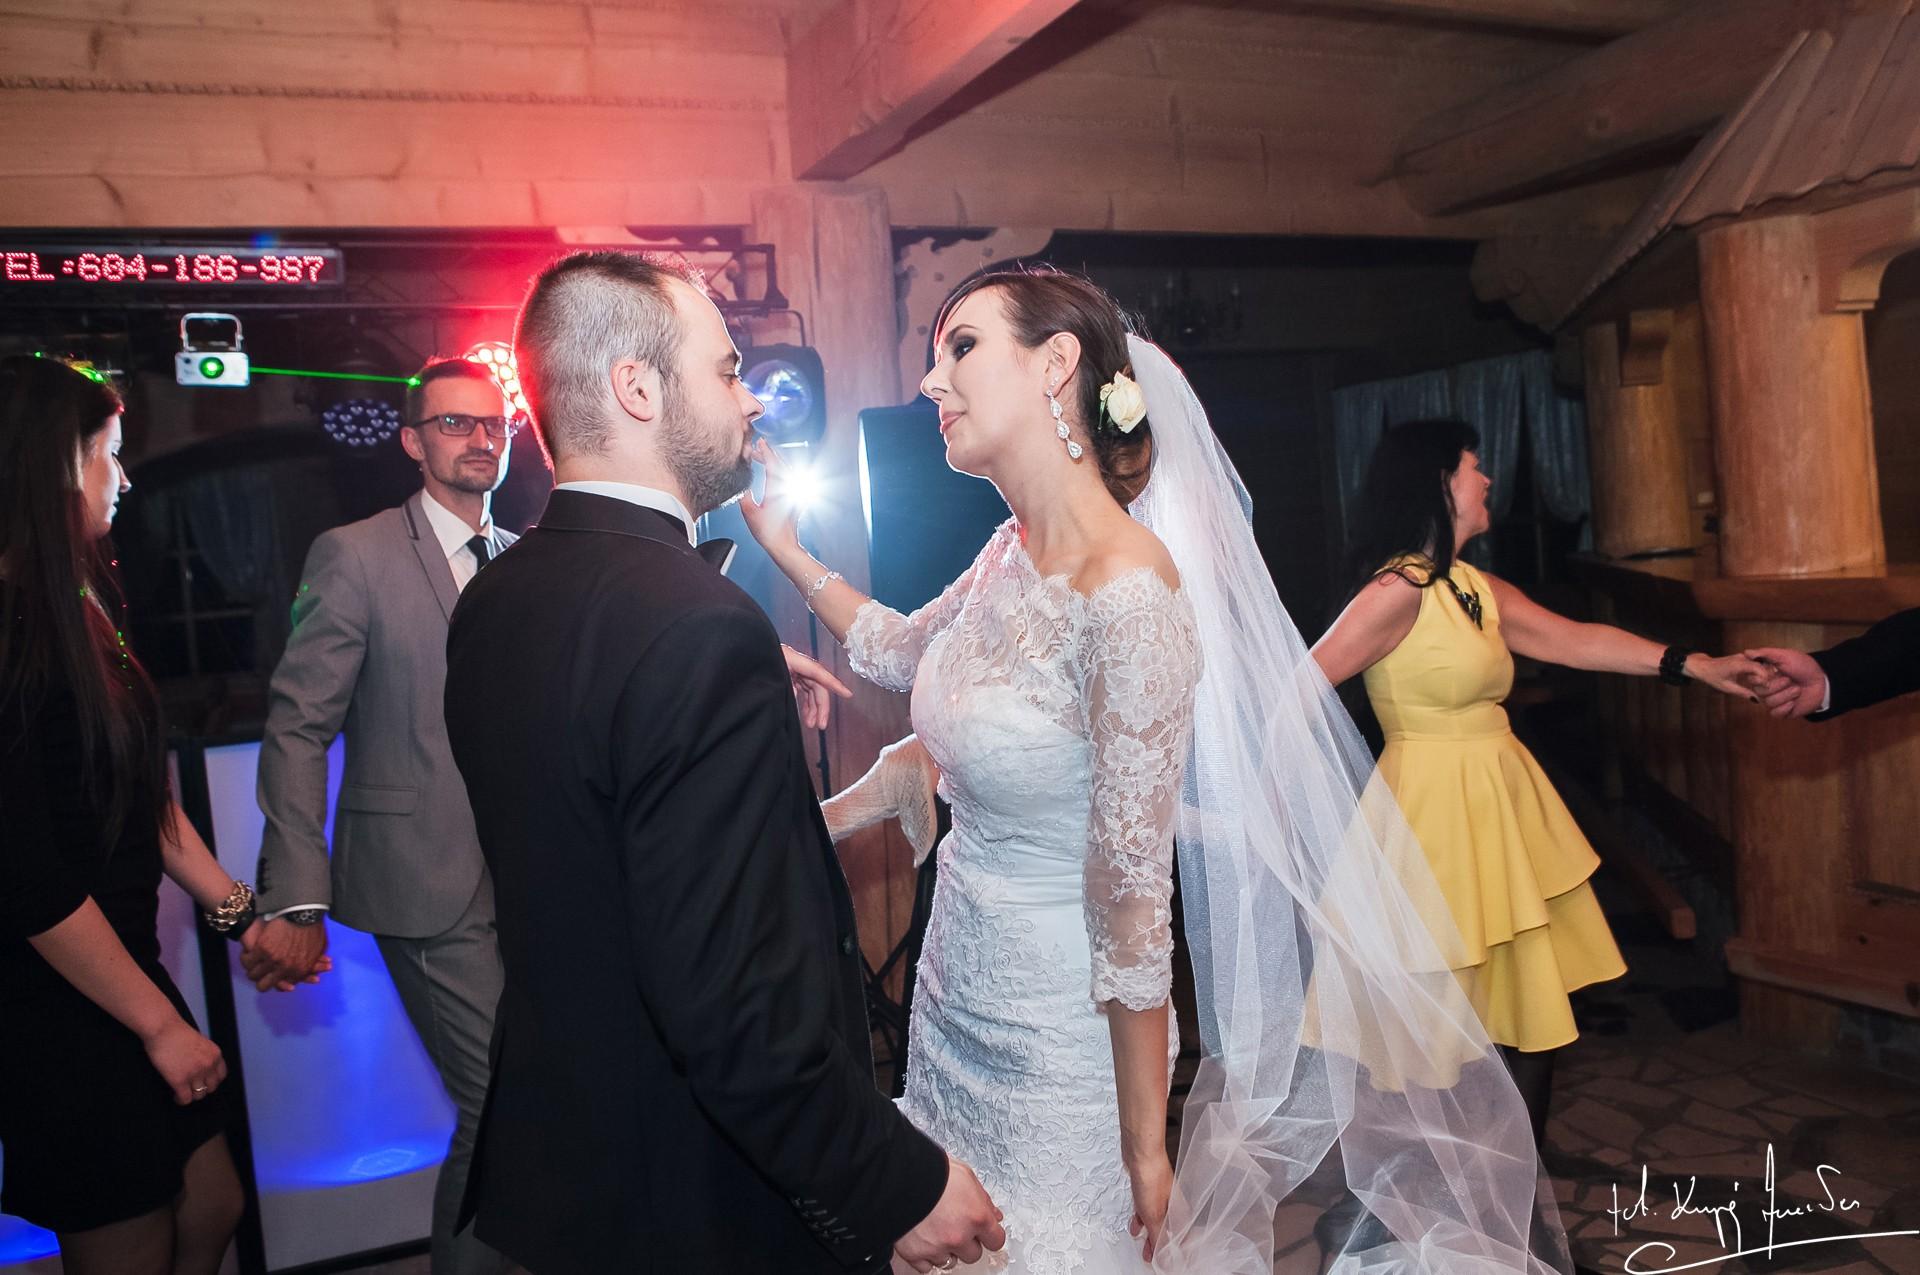 fotograf slubny szklarska poreba 69 Alicja & Tomasz